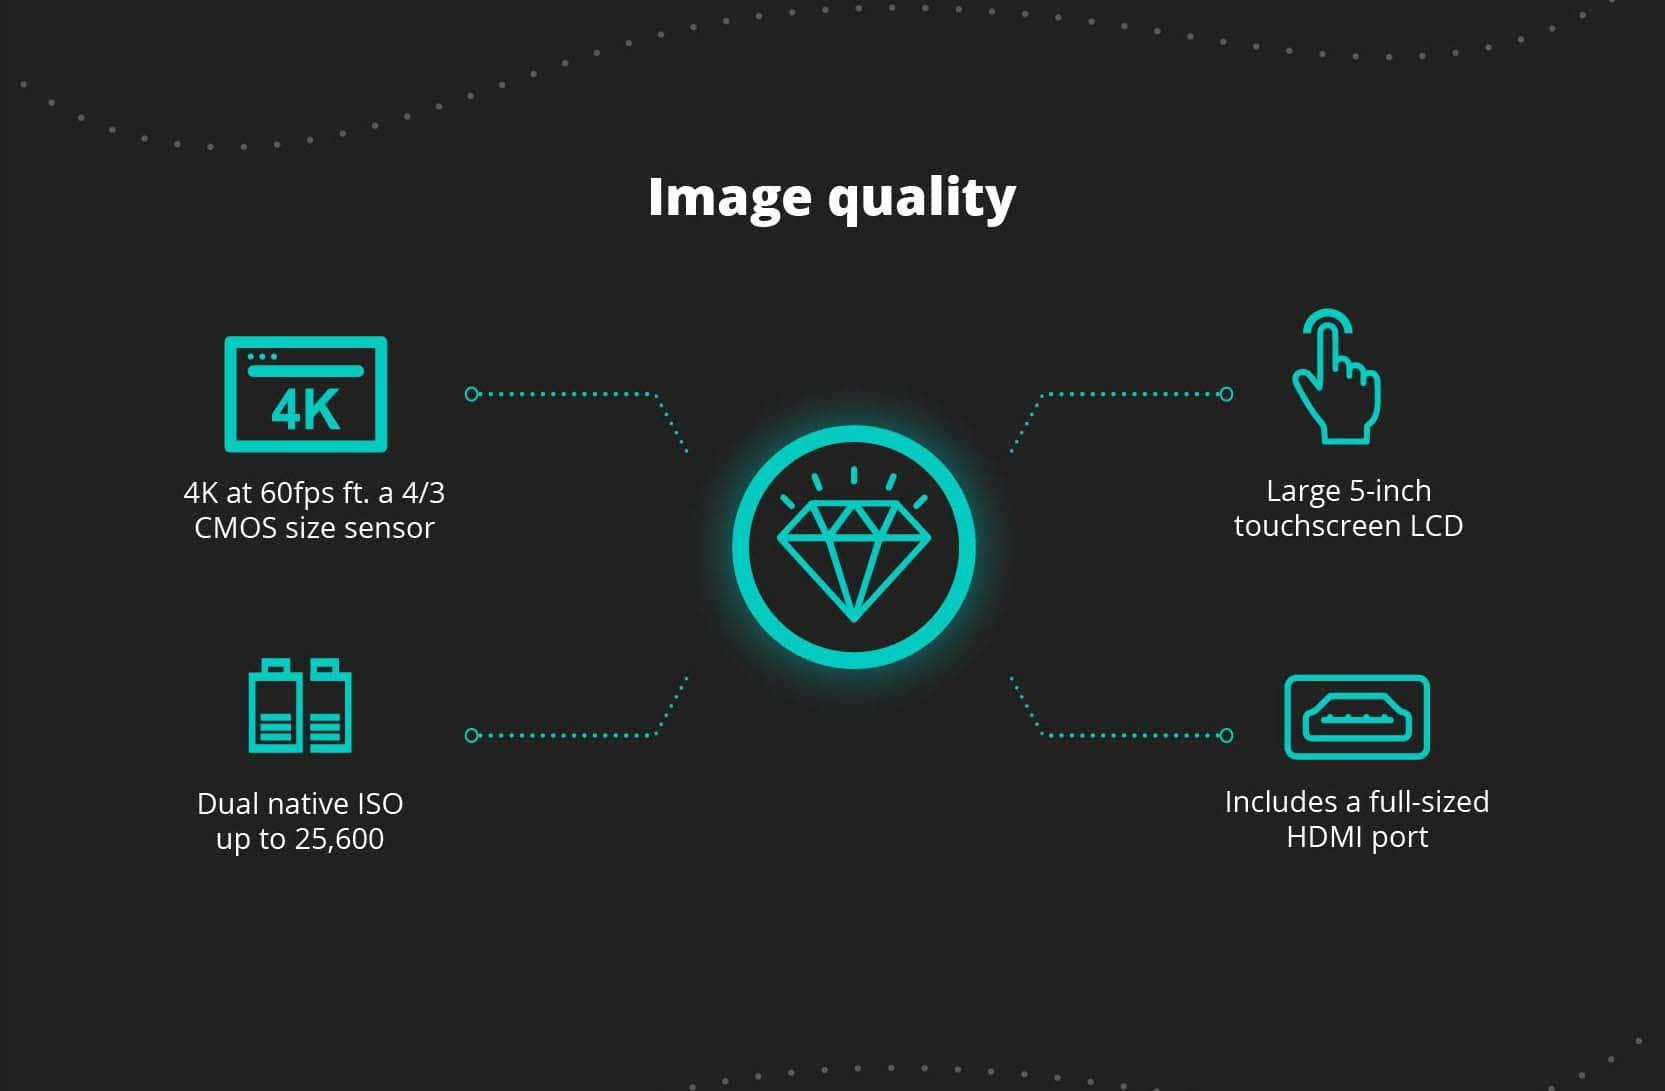 Blackmagic Pocket Cinema Camera 4K image quality